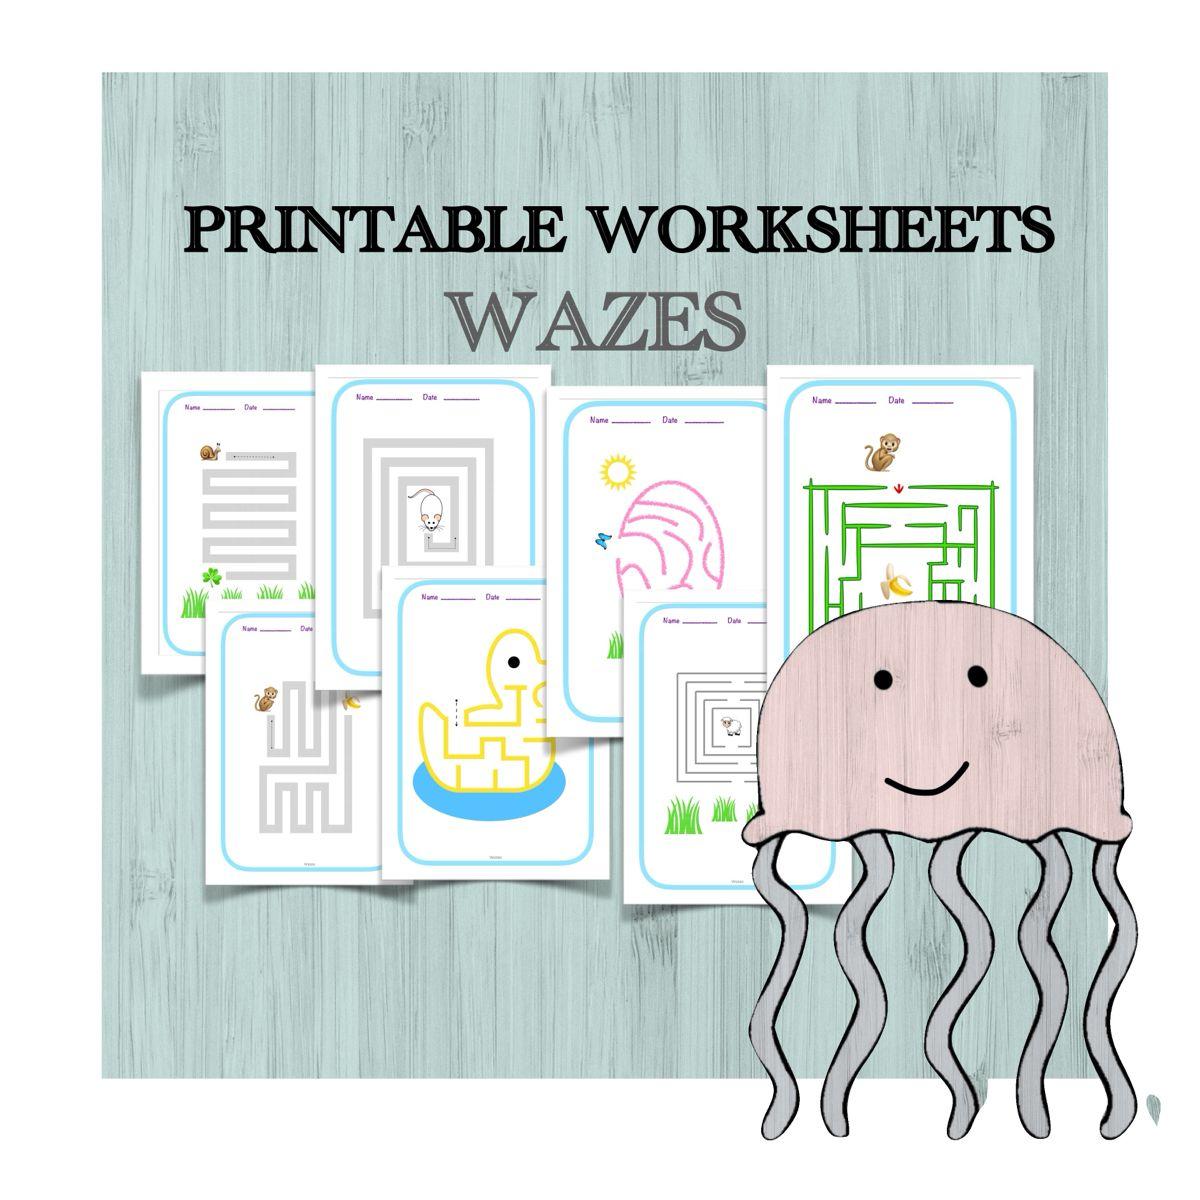 30 Printable Worksheets Maze For Kids Homeschool Education